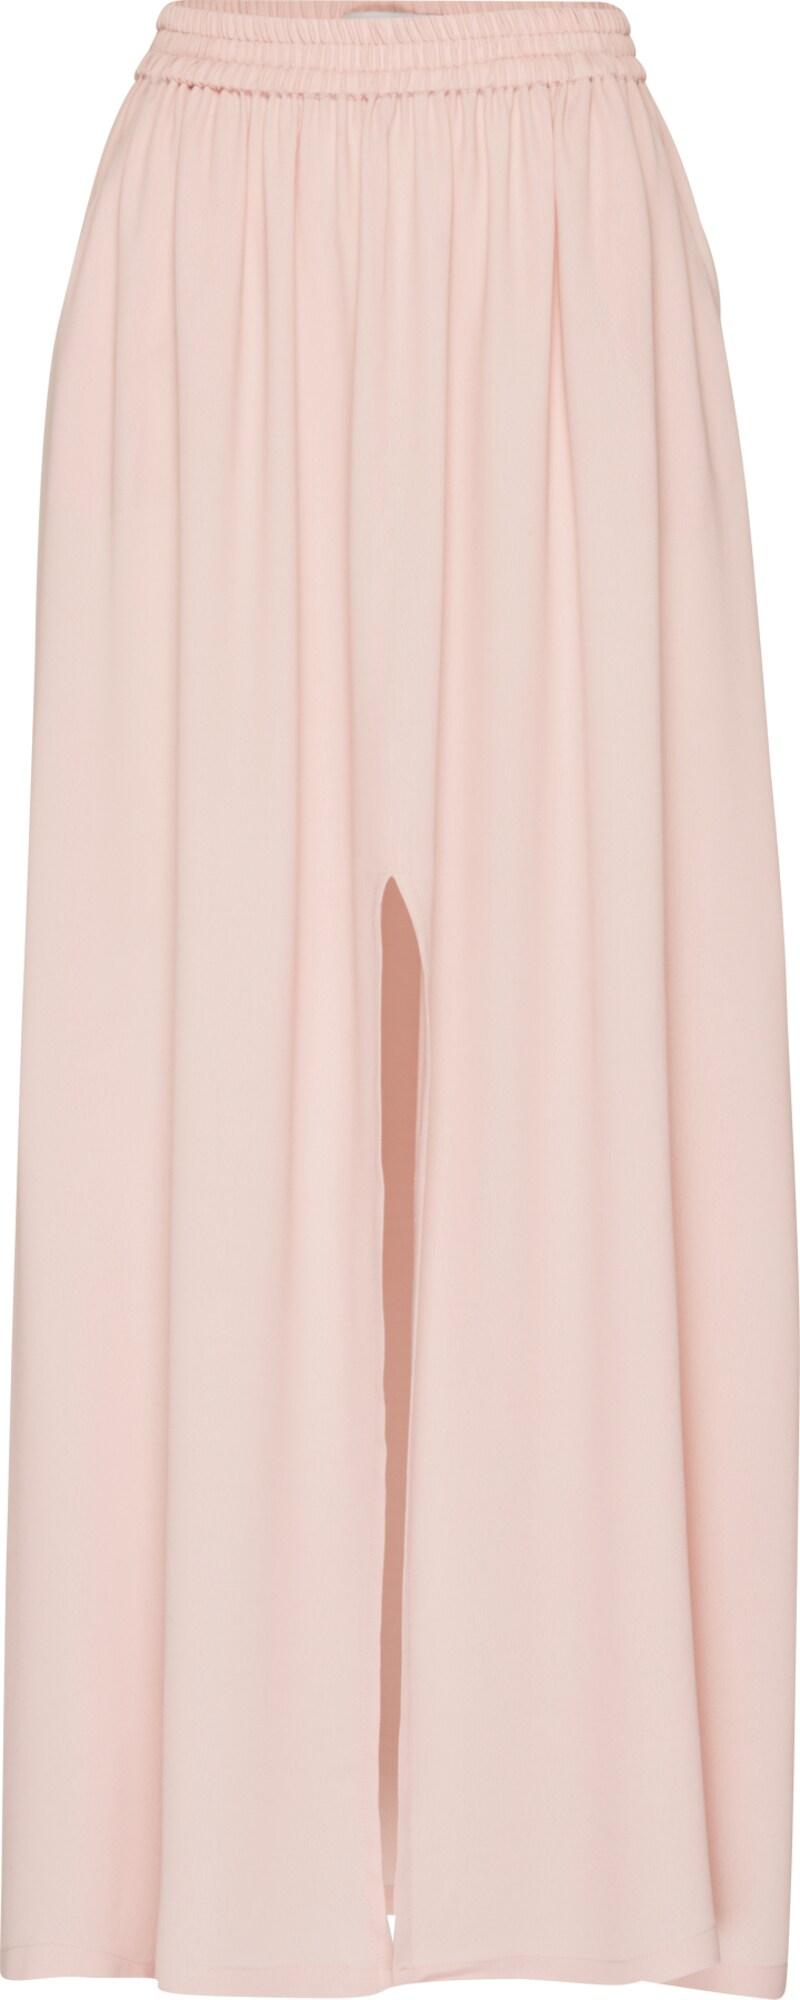 minimum maxi rock mit schlitz 39 henna 39 in pink about you. Black Bedroom Furniture Sets. Home Design Ideas